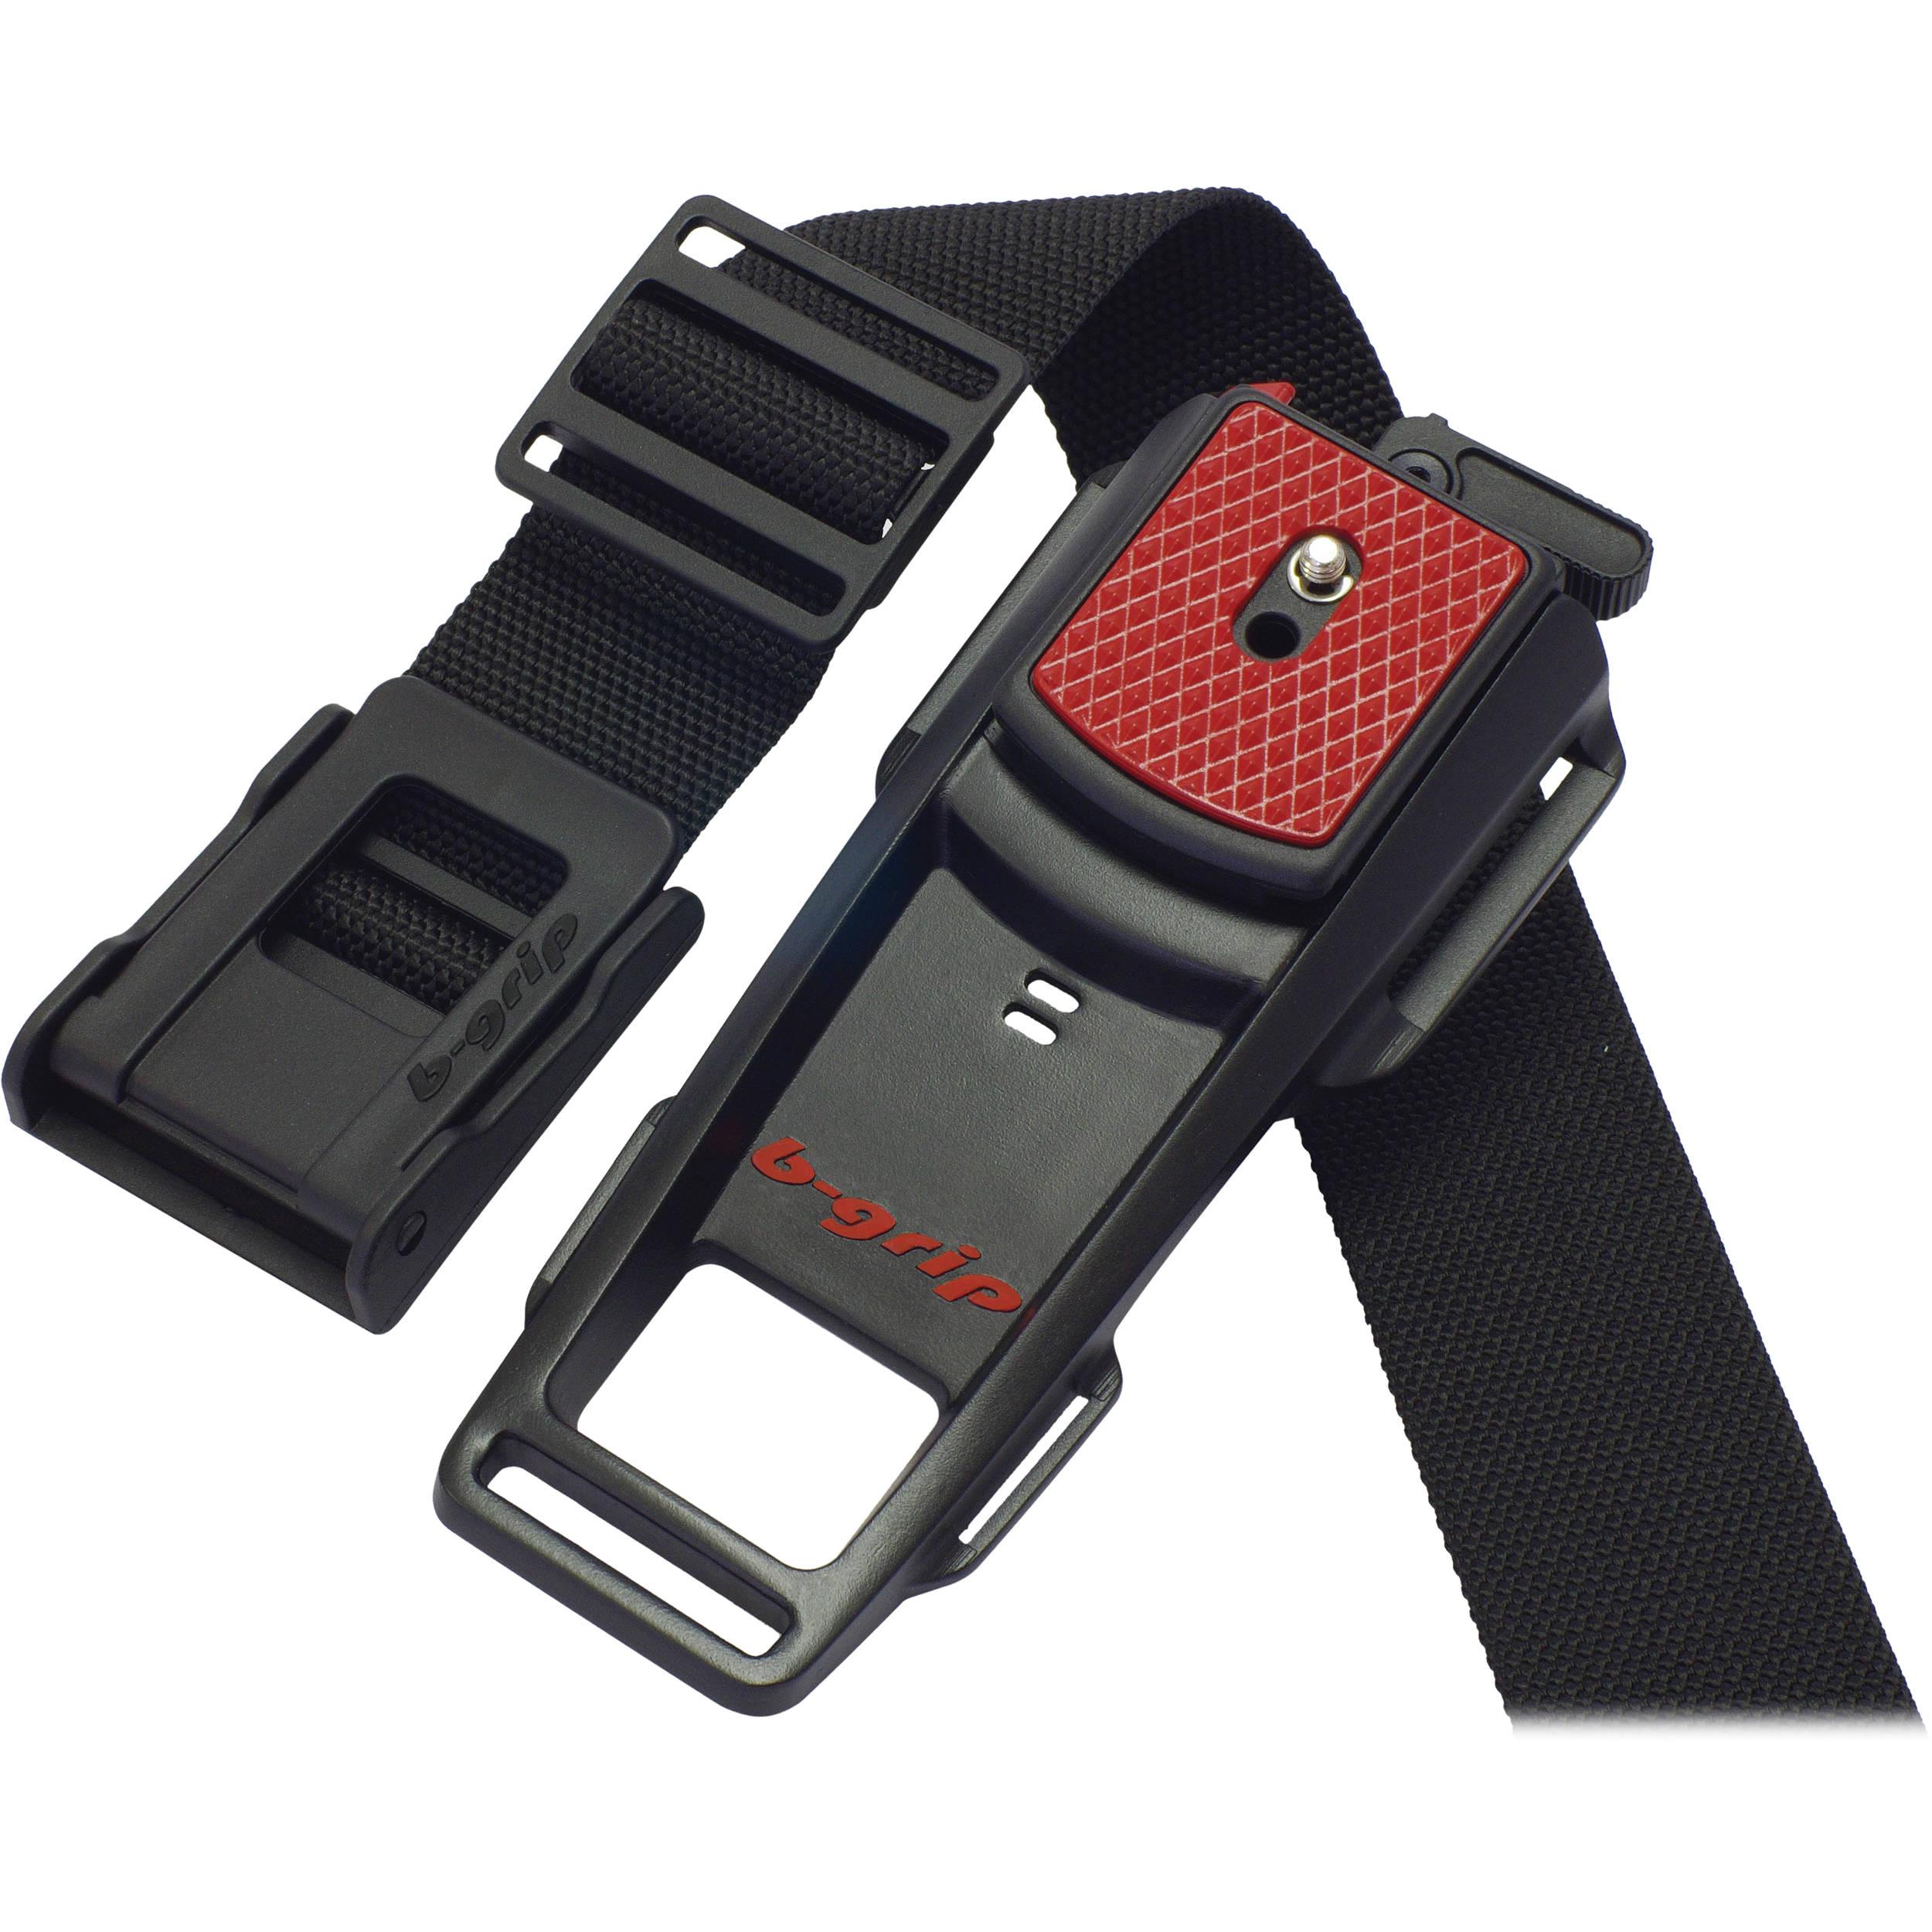 B-Grip  EVO Camera Belt Grip $26.99 @ B&H Photo w/ Free Shipping